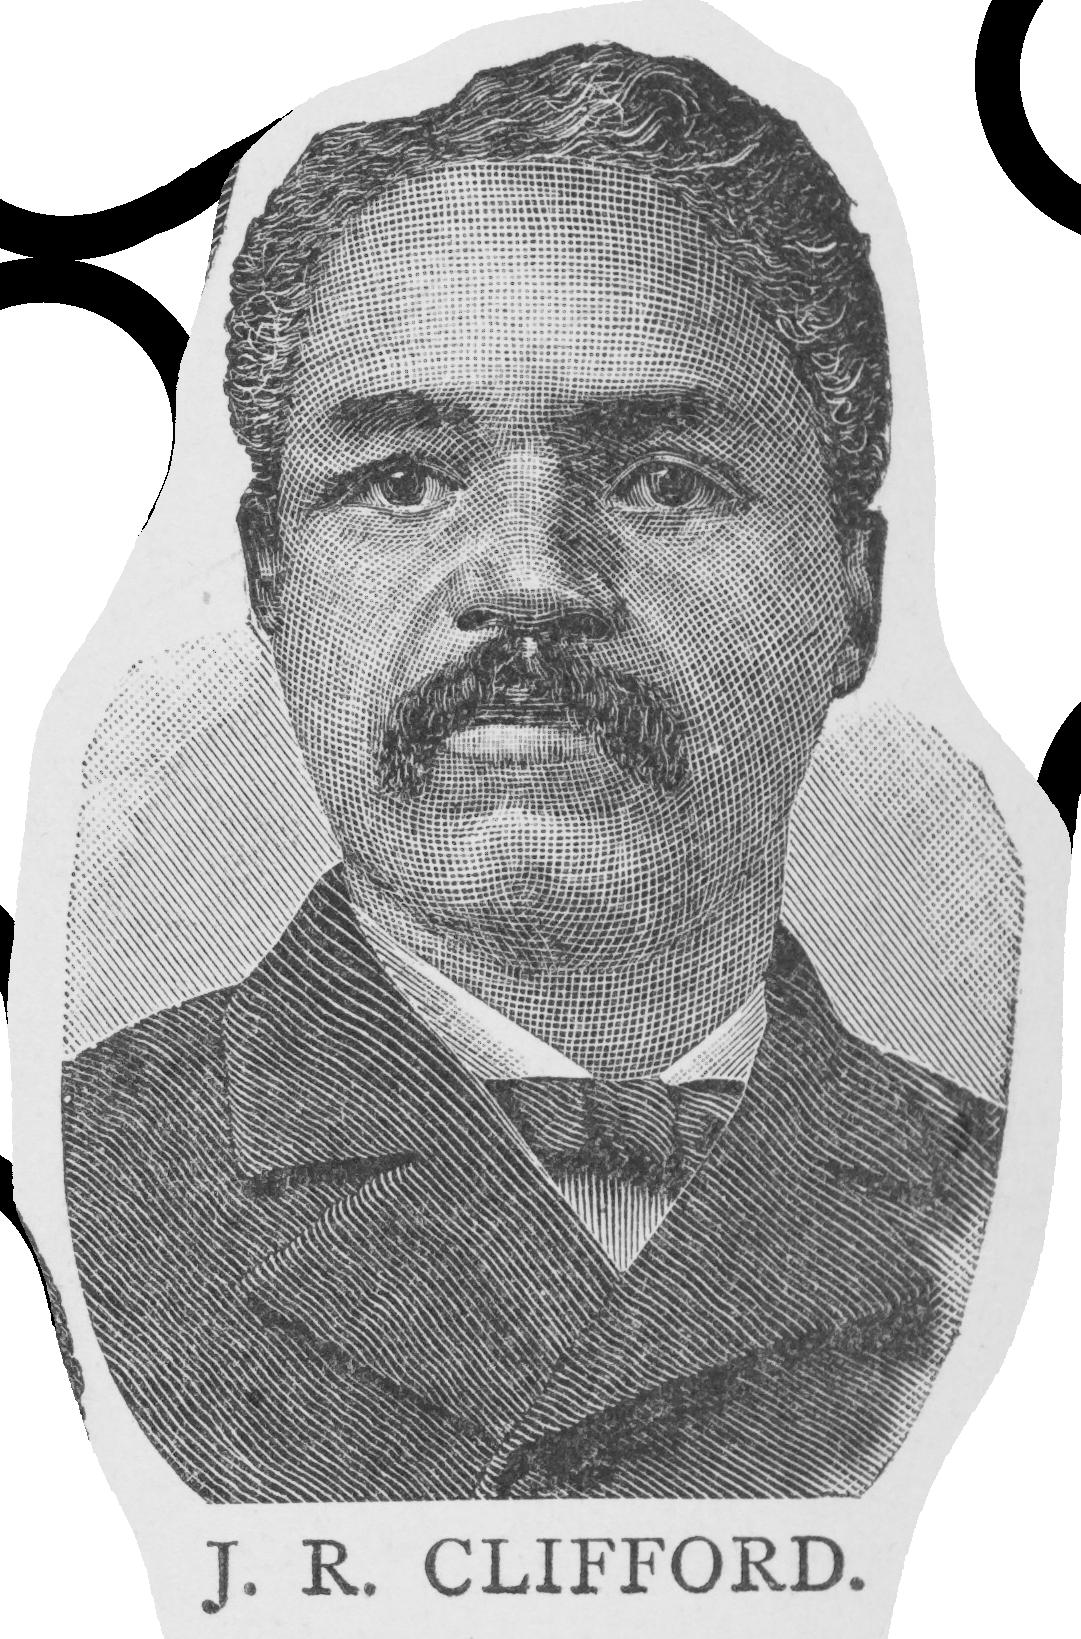 J R Smith Links Black Friday To Slavery On Instagram: J. R. Clifford